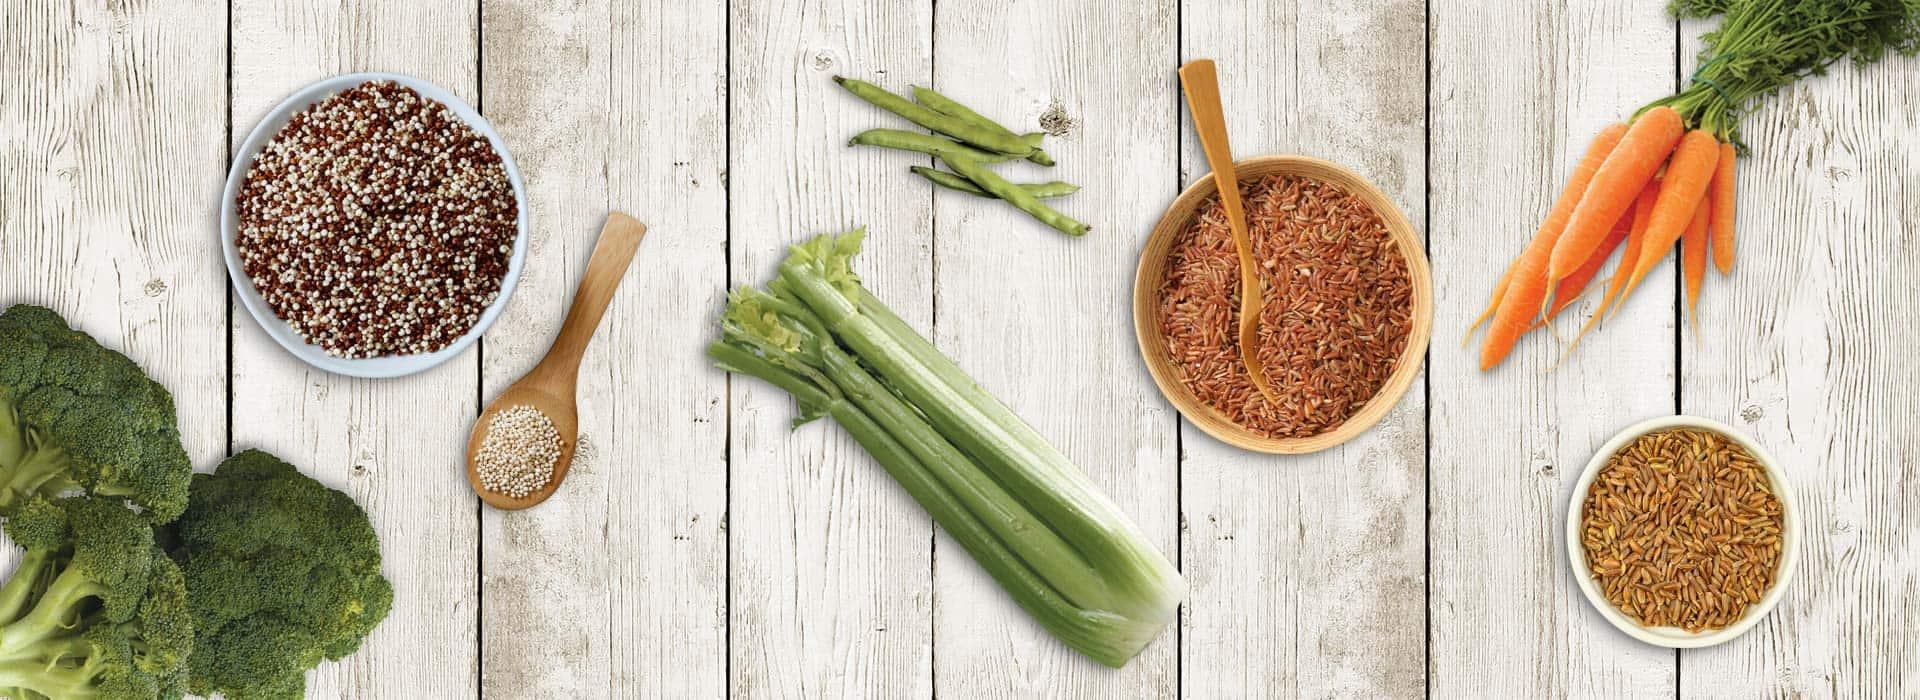 Ancient grains - Quinoa, rice and veggies on white wood